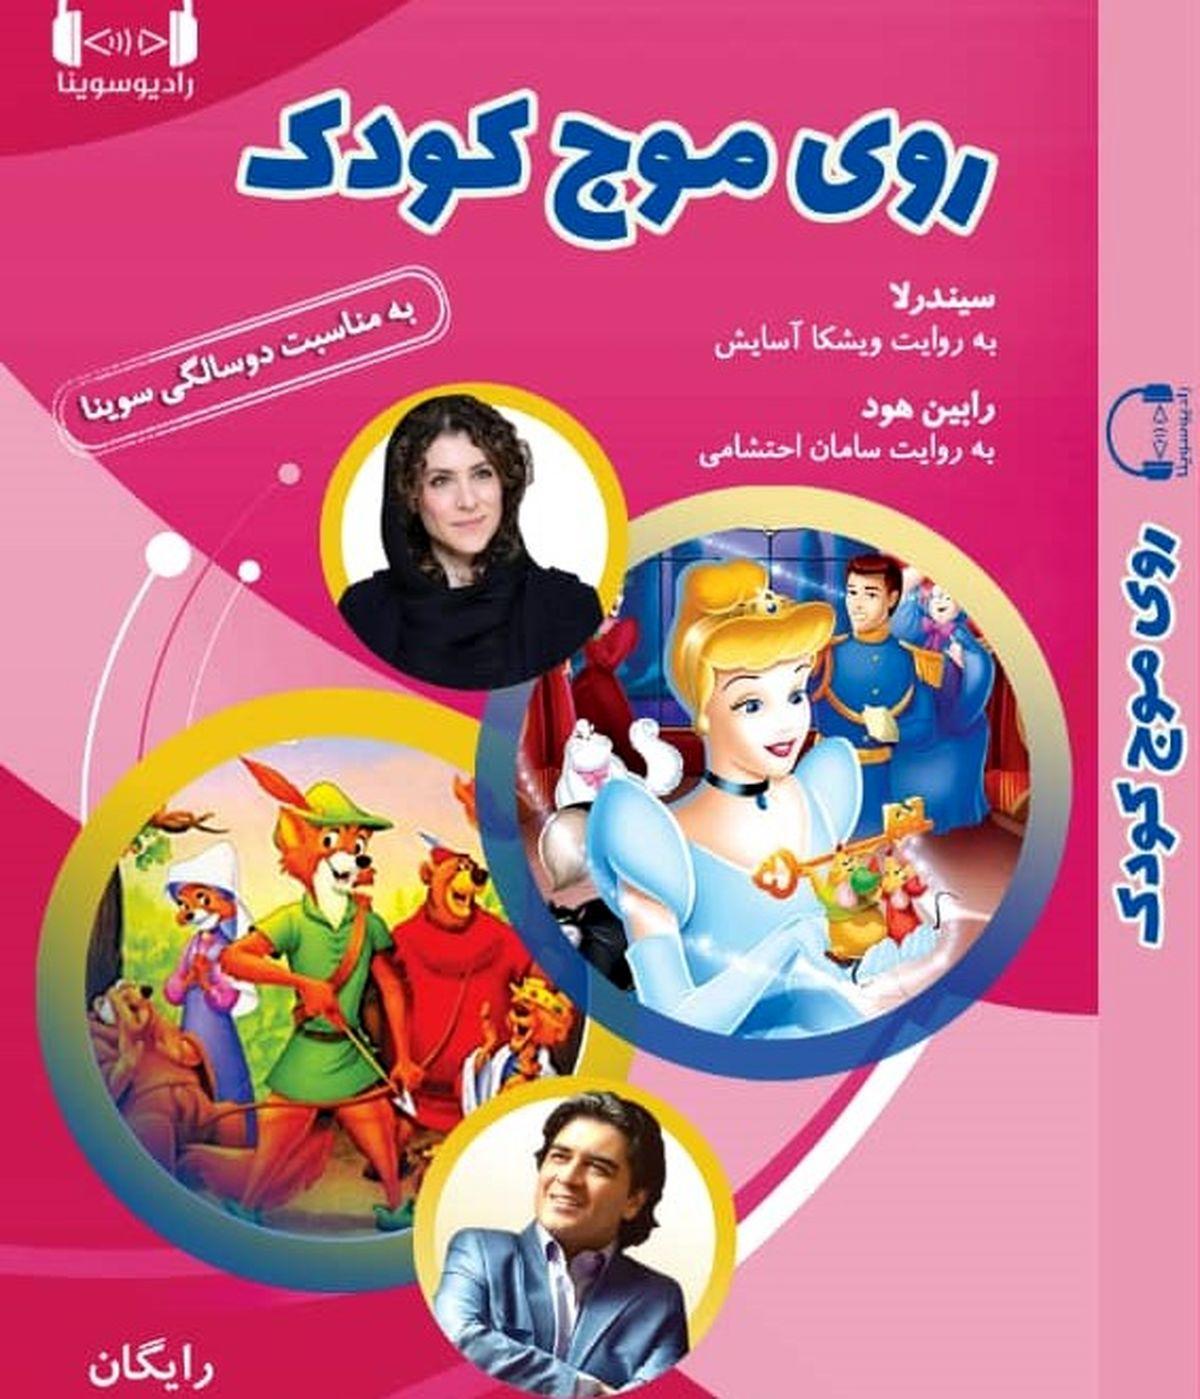 پانصد دیویدی صوتی ویژه کودکان توزیع شد